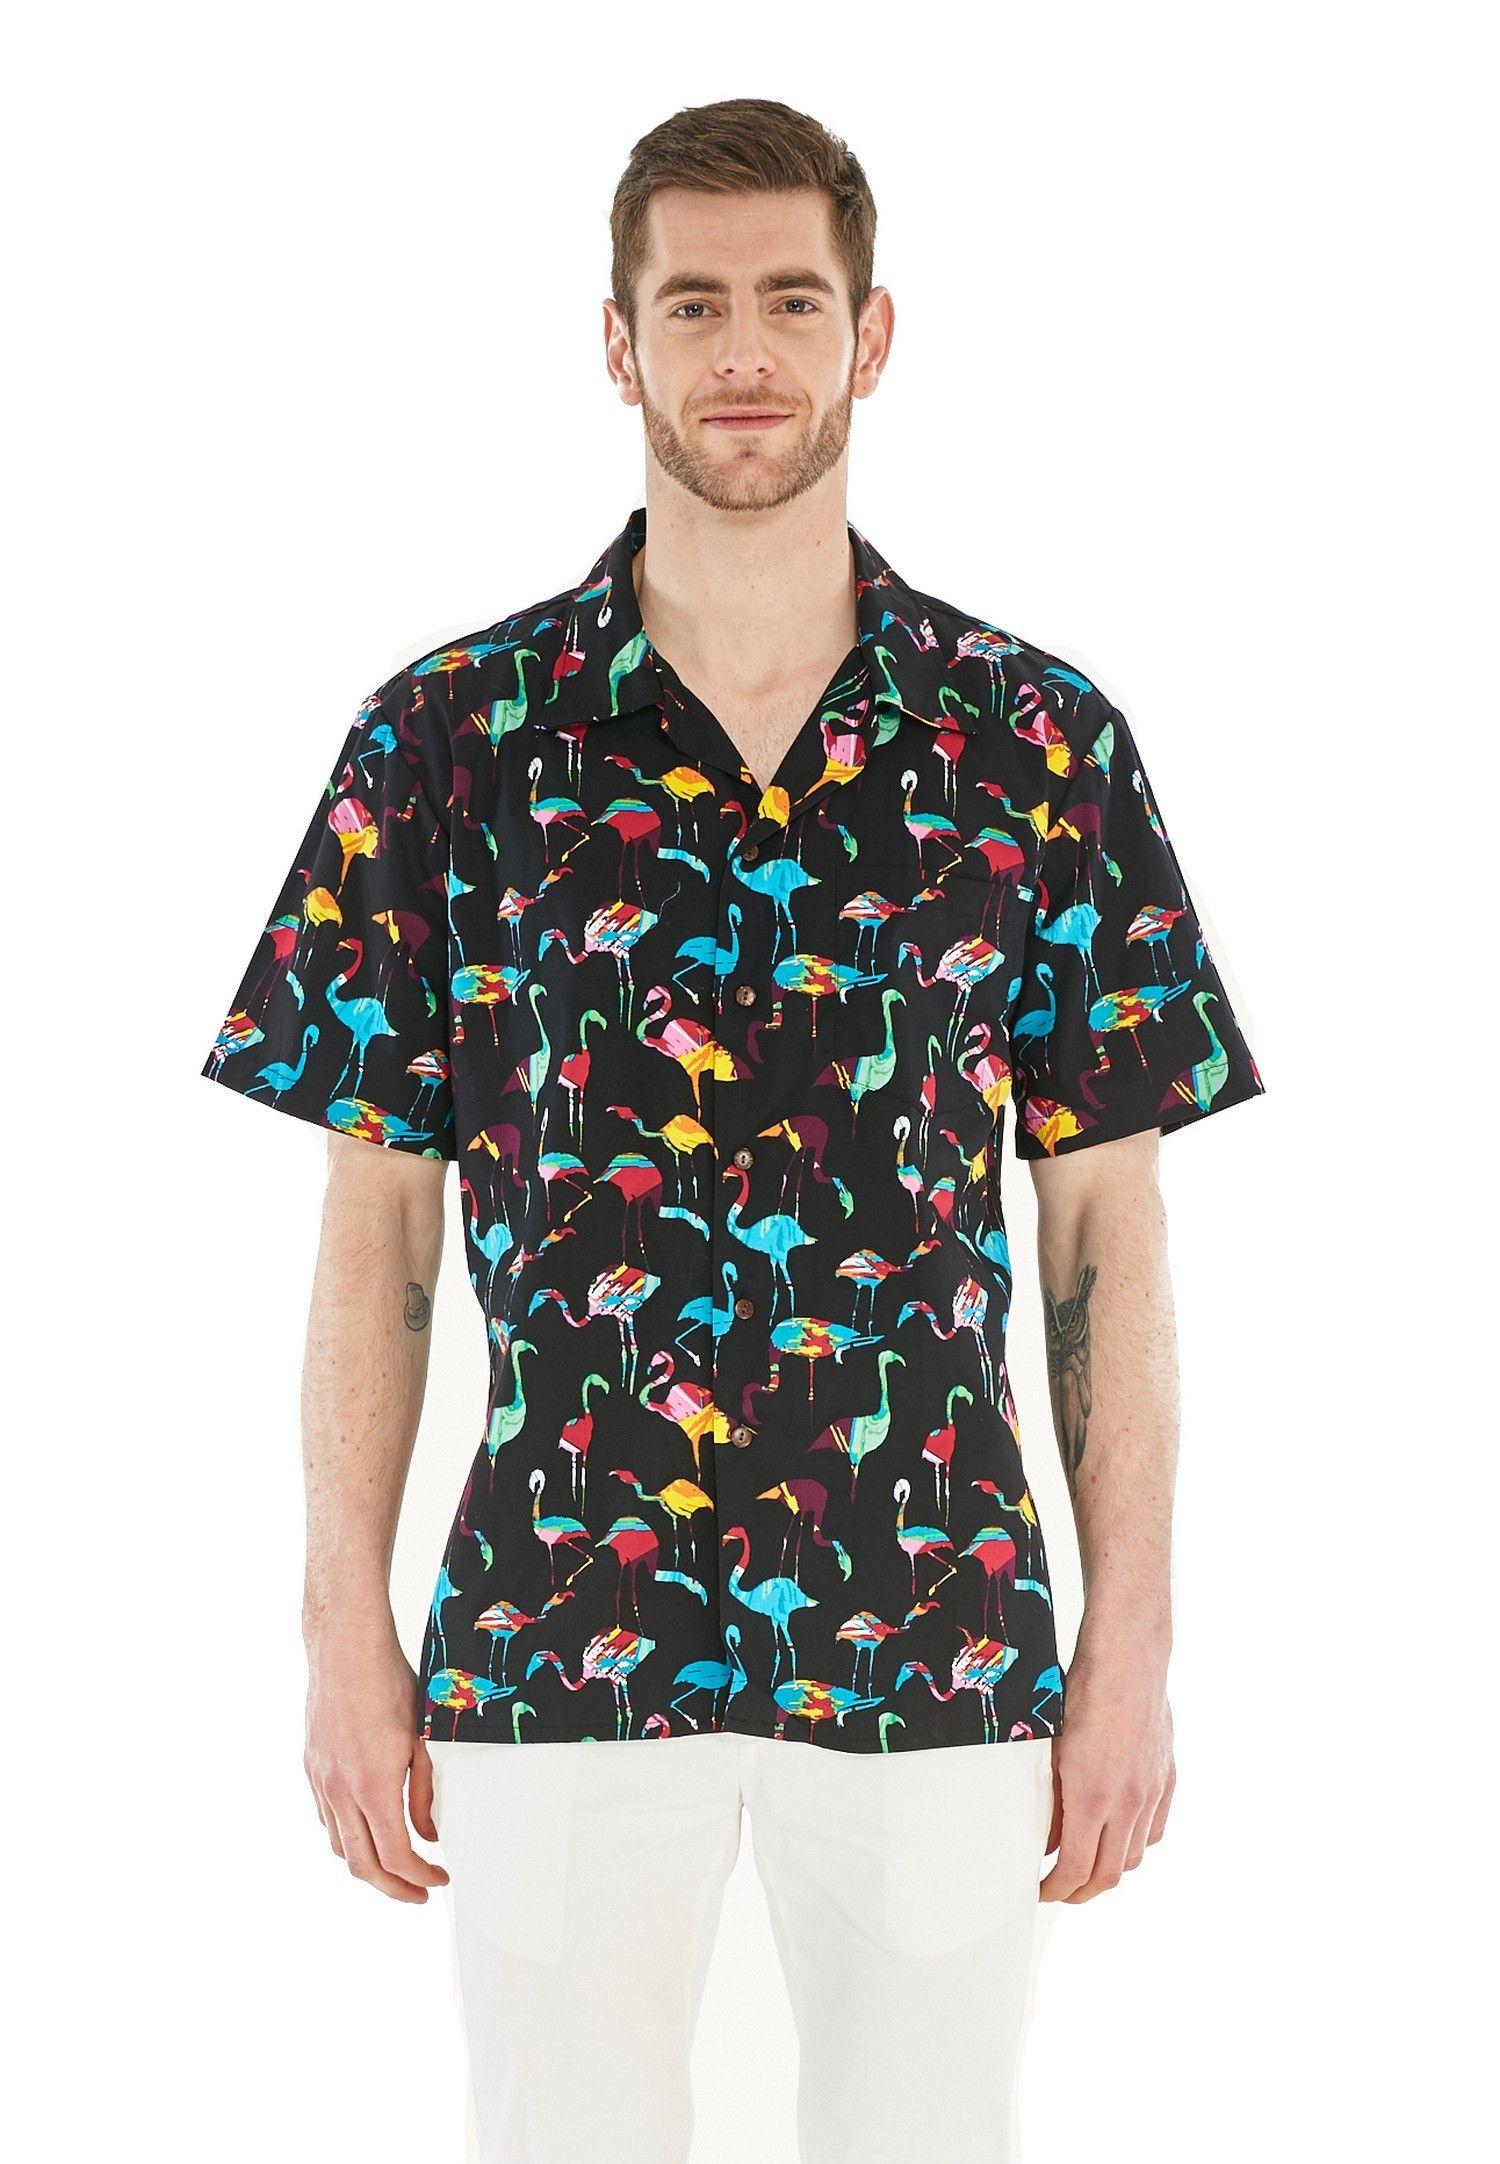 c76898b83 Men Hawaiian Aloha Shirt in Flamingo Party Black   Flamingos ...